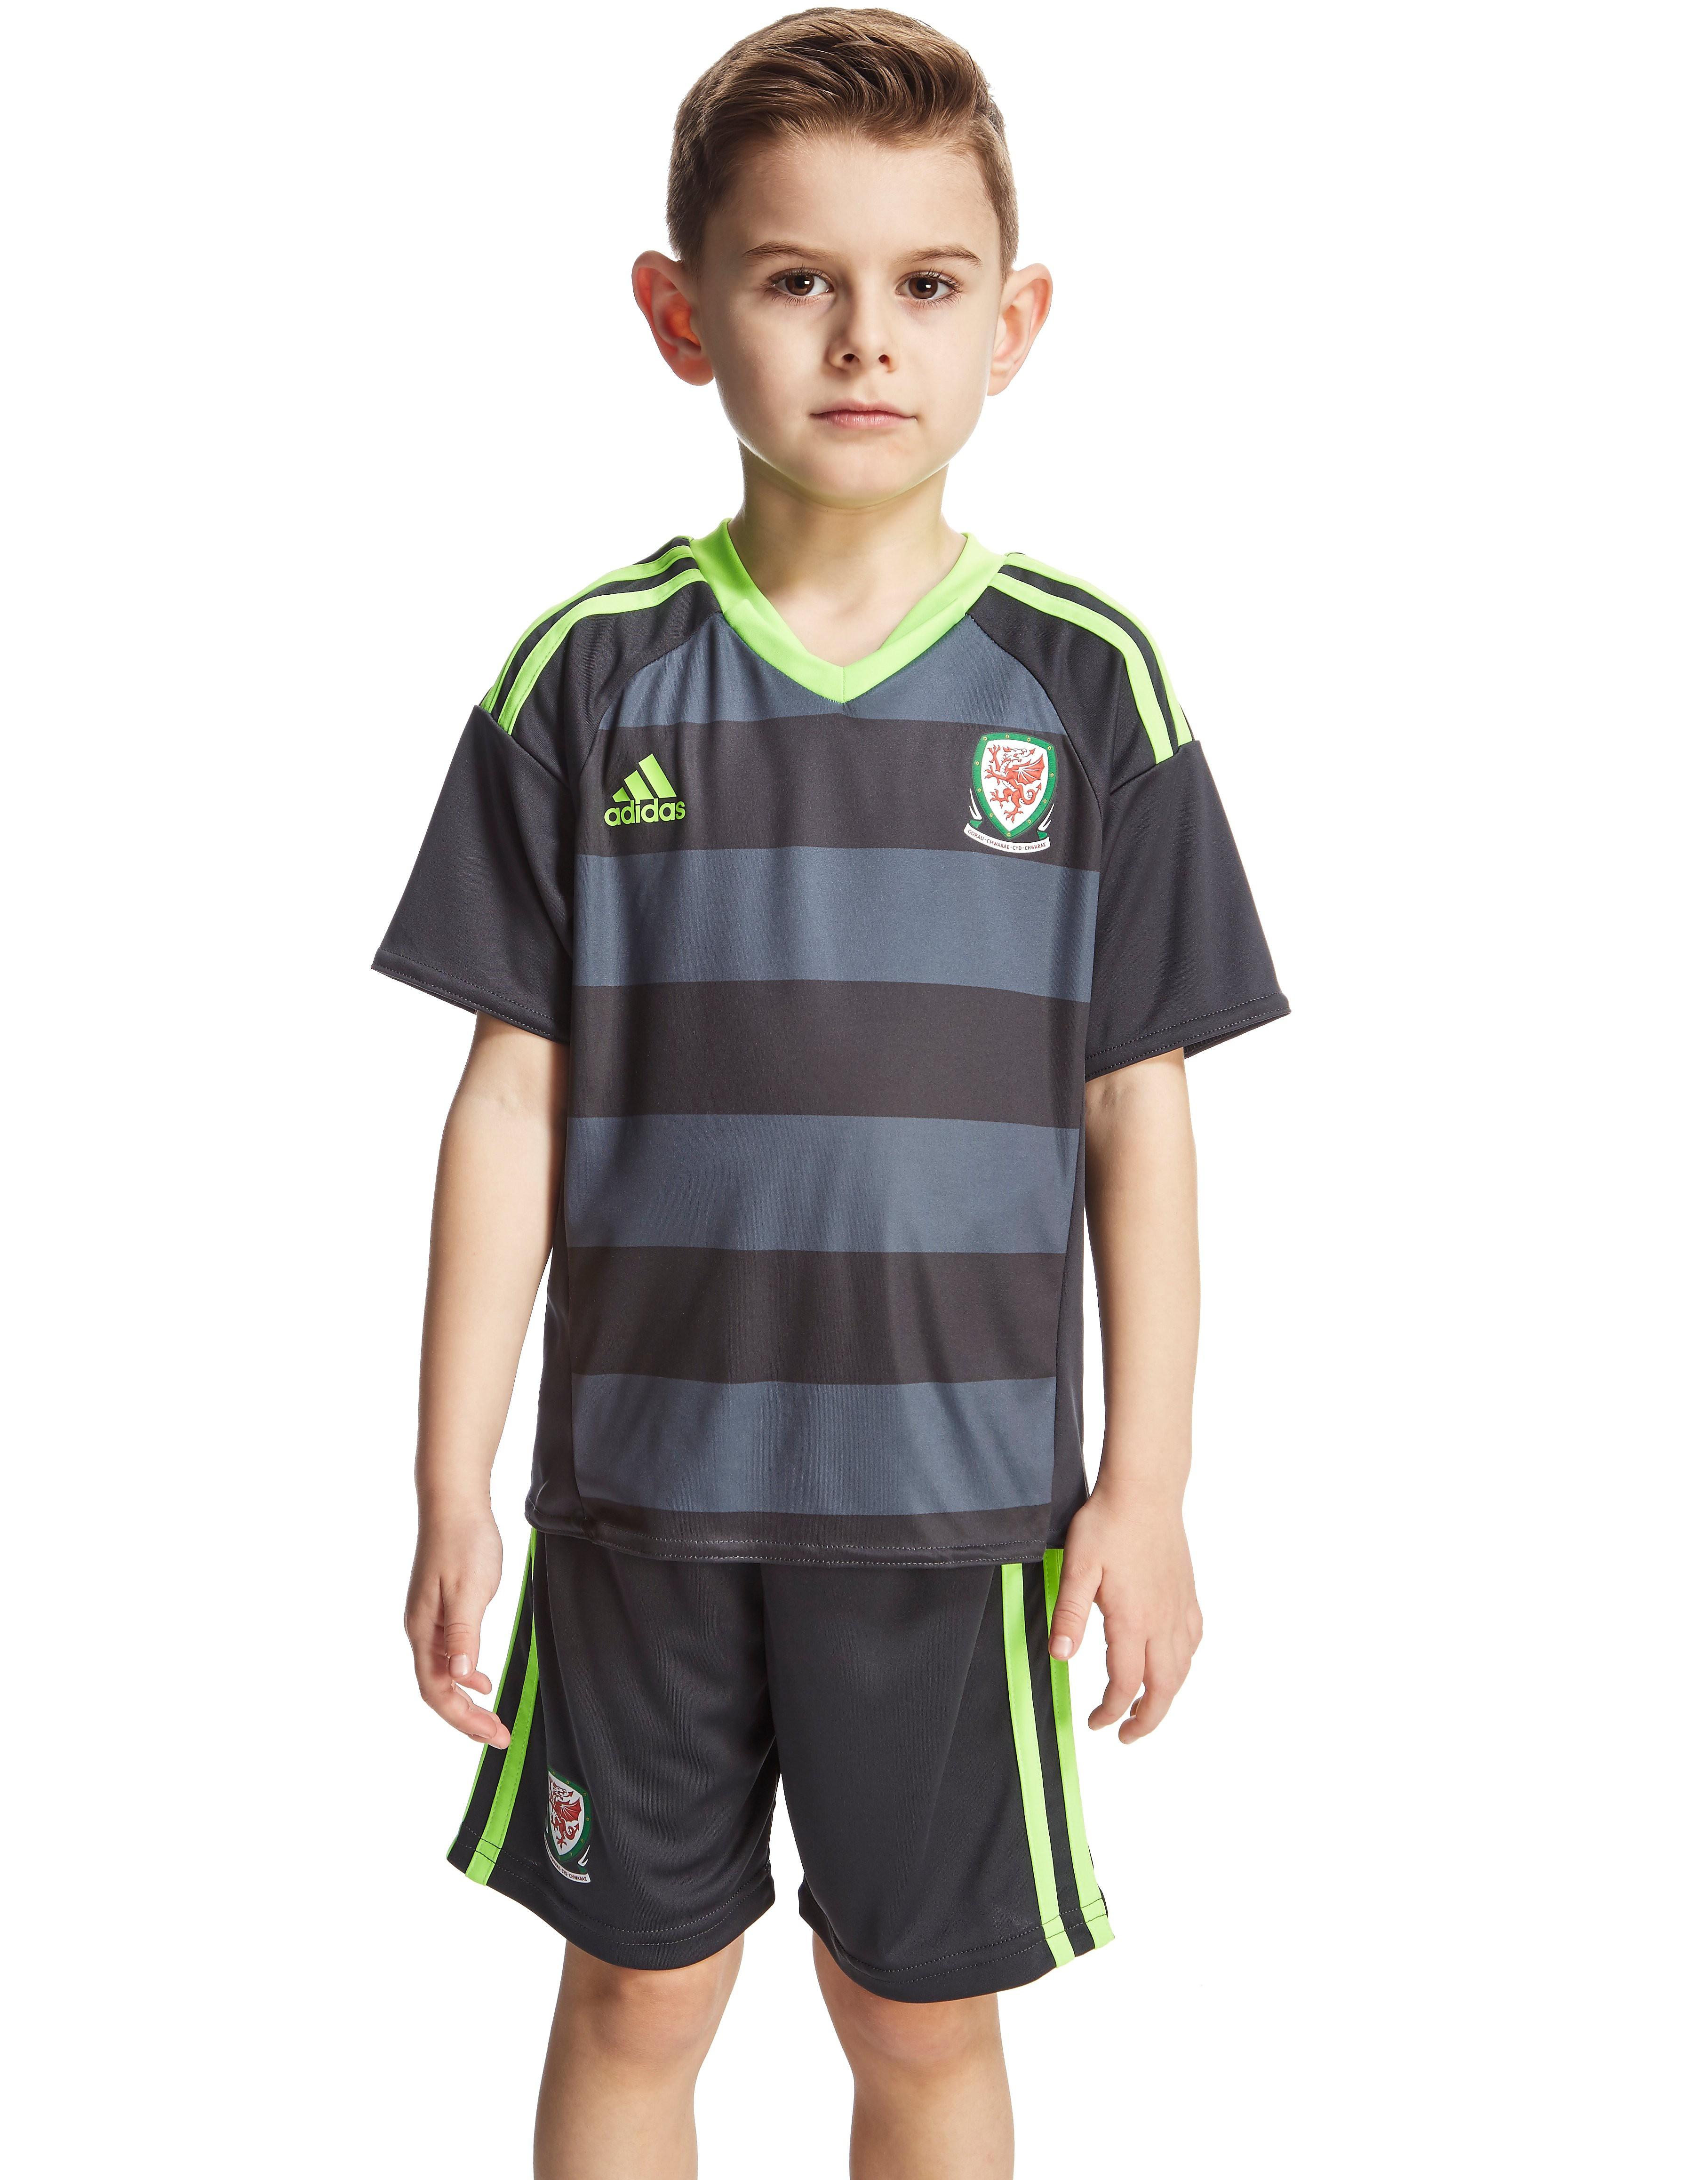 adidas FA Wales Away 2016 Kit Children